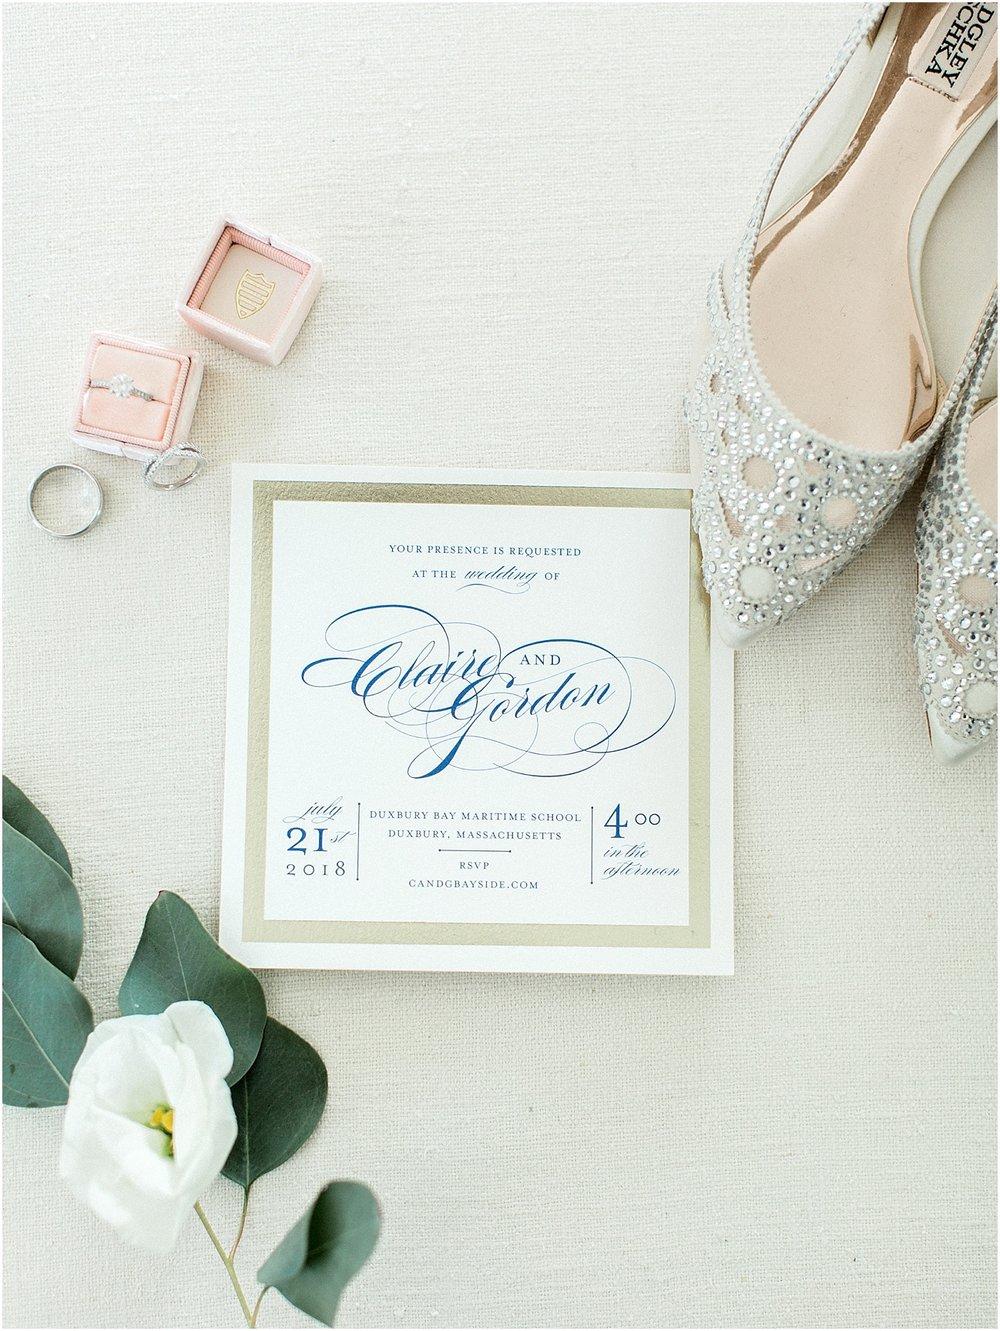 claire_gordon_duxbury_bay_maritime_school_beach_dock_powder_point_bridge_cape_cod_boston_wedding_photographer_meredith_jane_photography_photo_0615.jpg